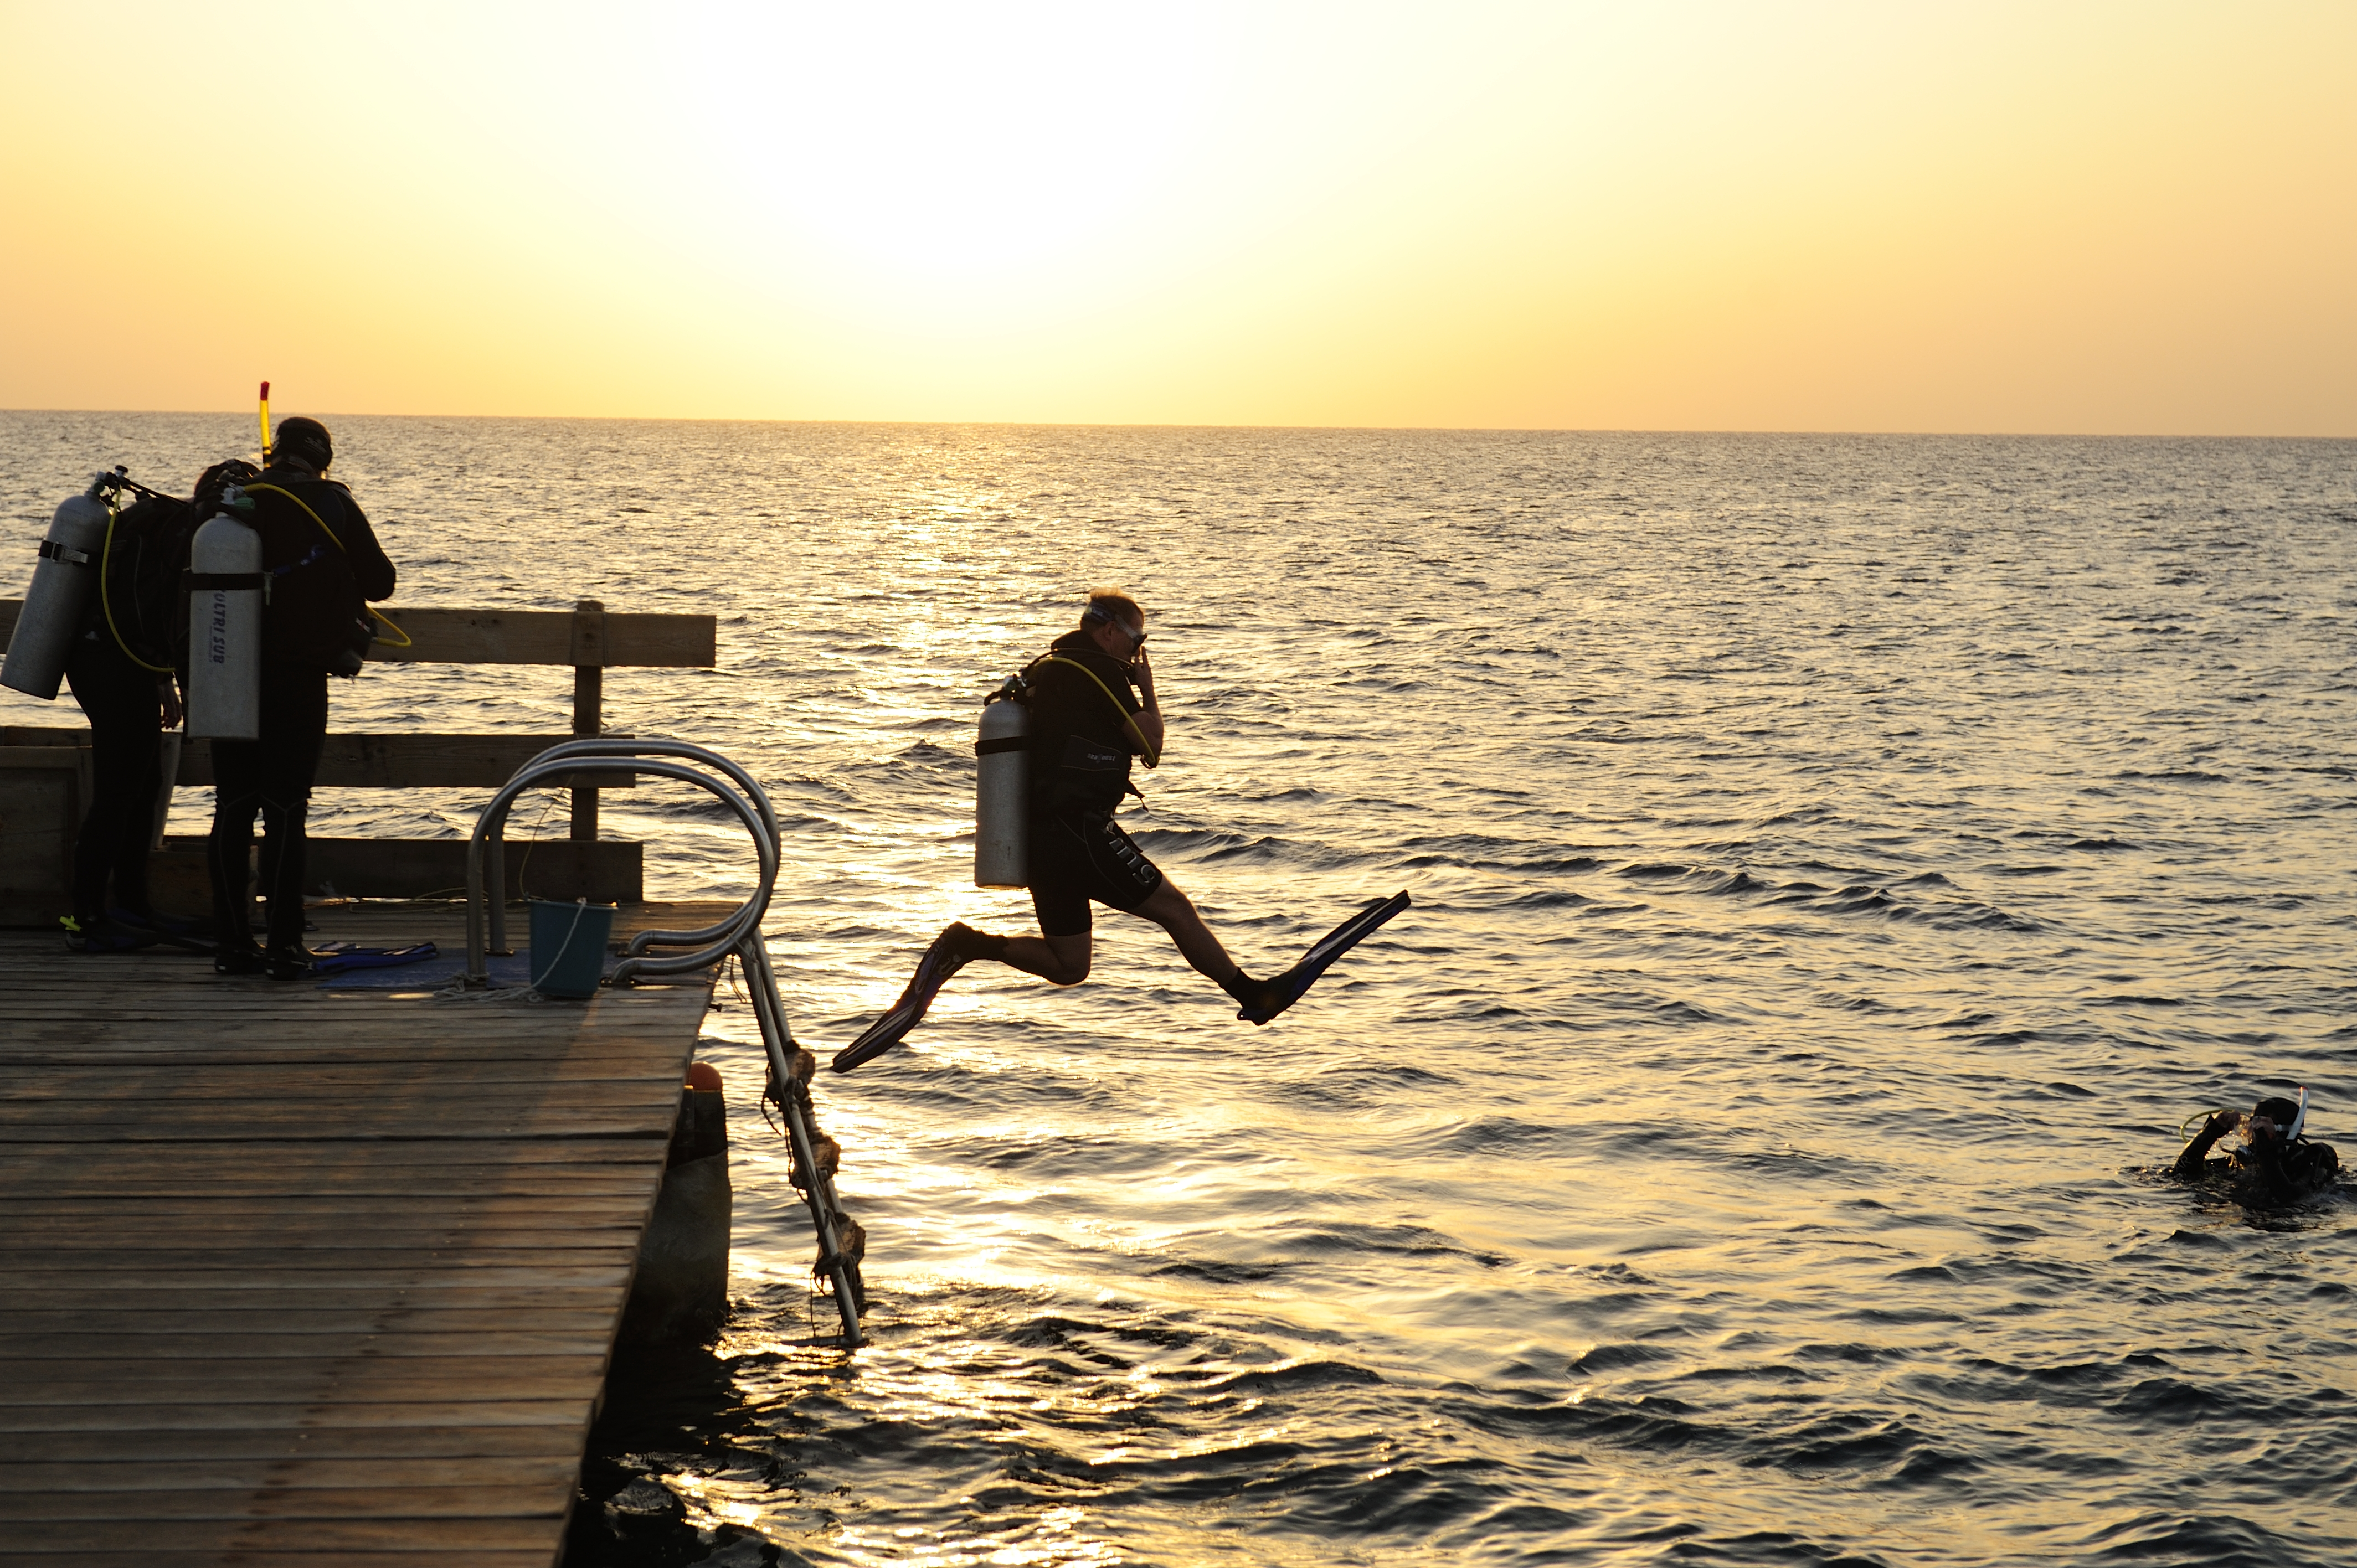 Somabay Egypt - Diving